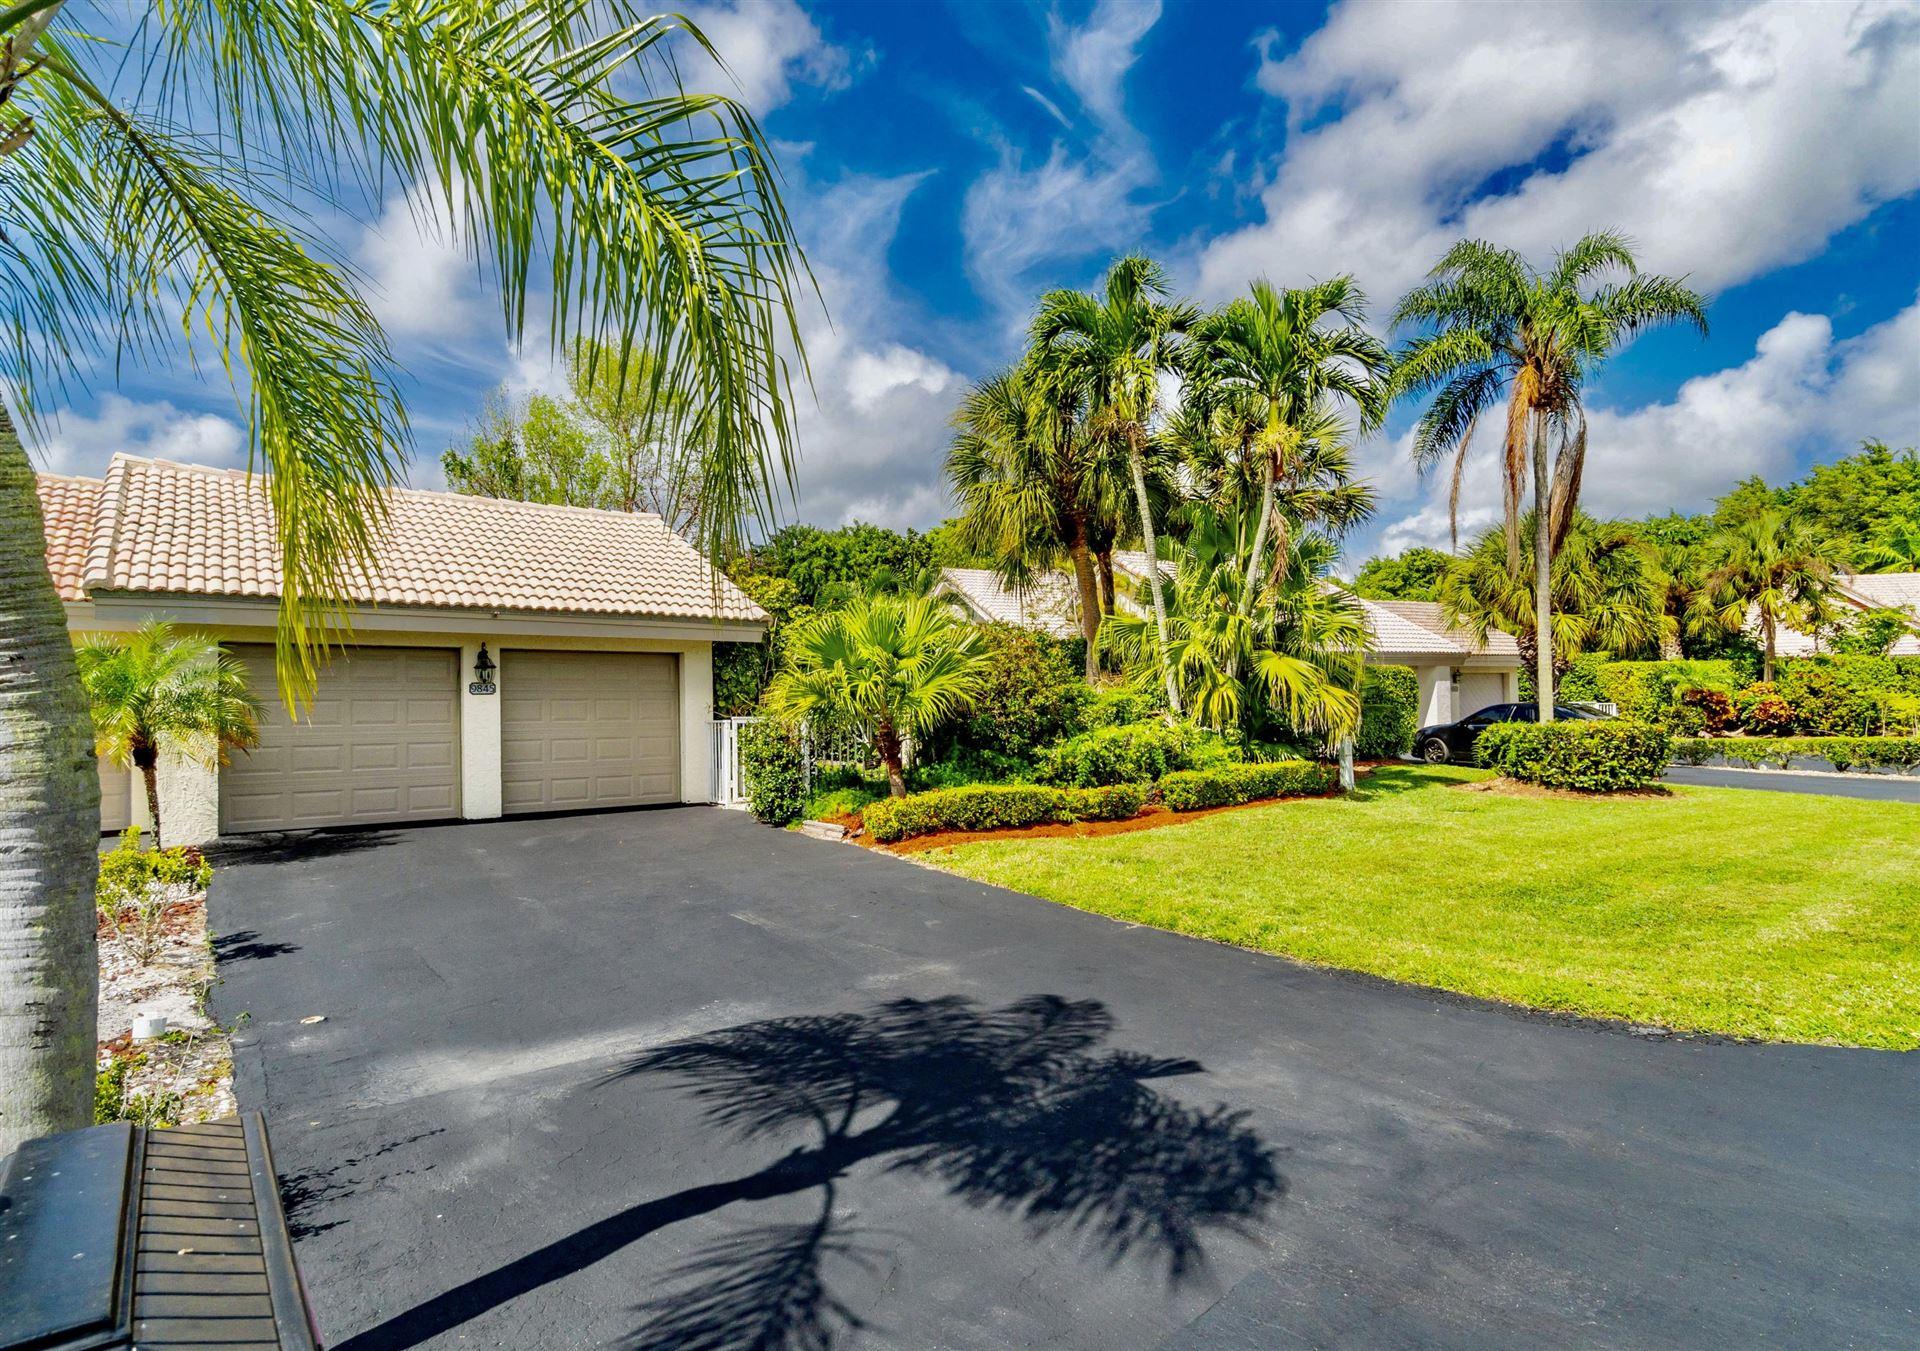 9845 Erica Court, Boca Raton, FL 33496 - #: RX-10602666